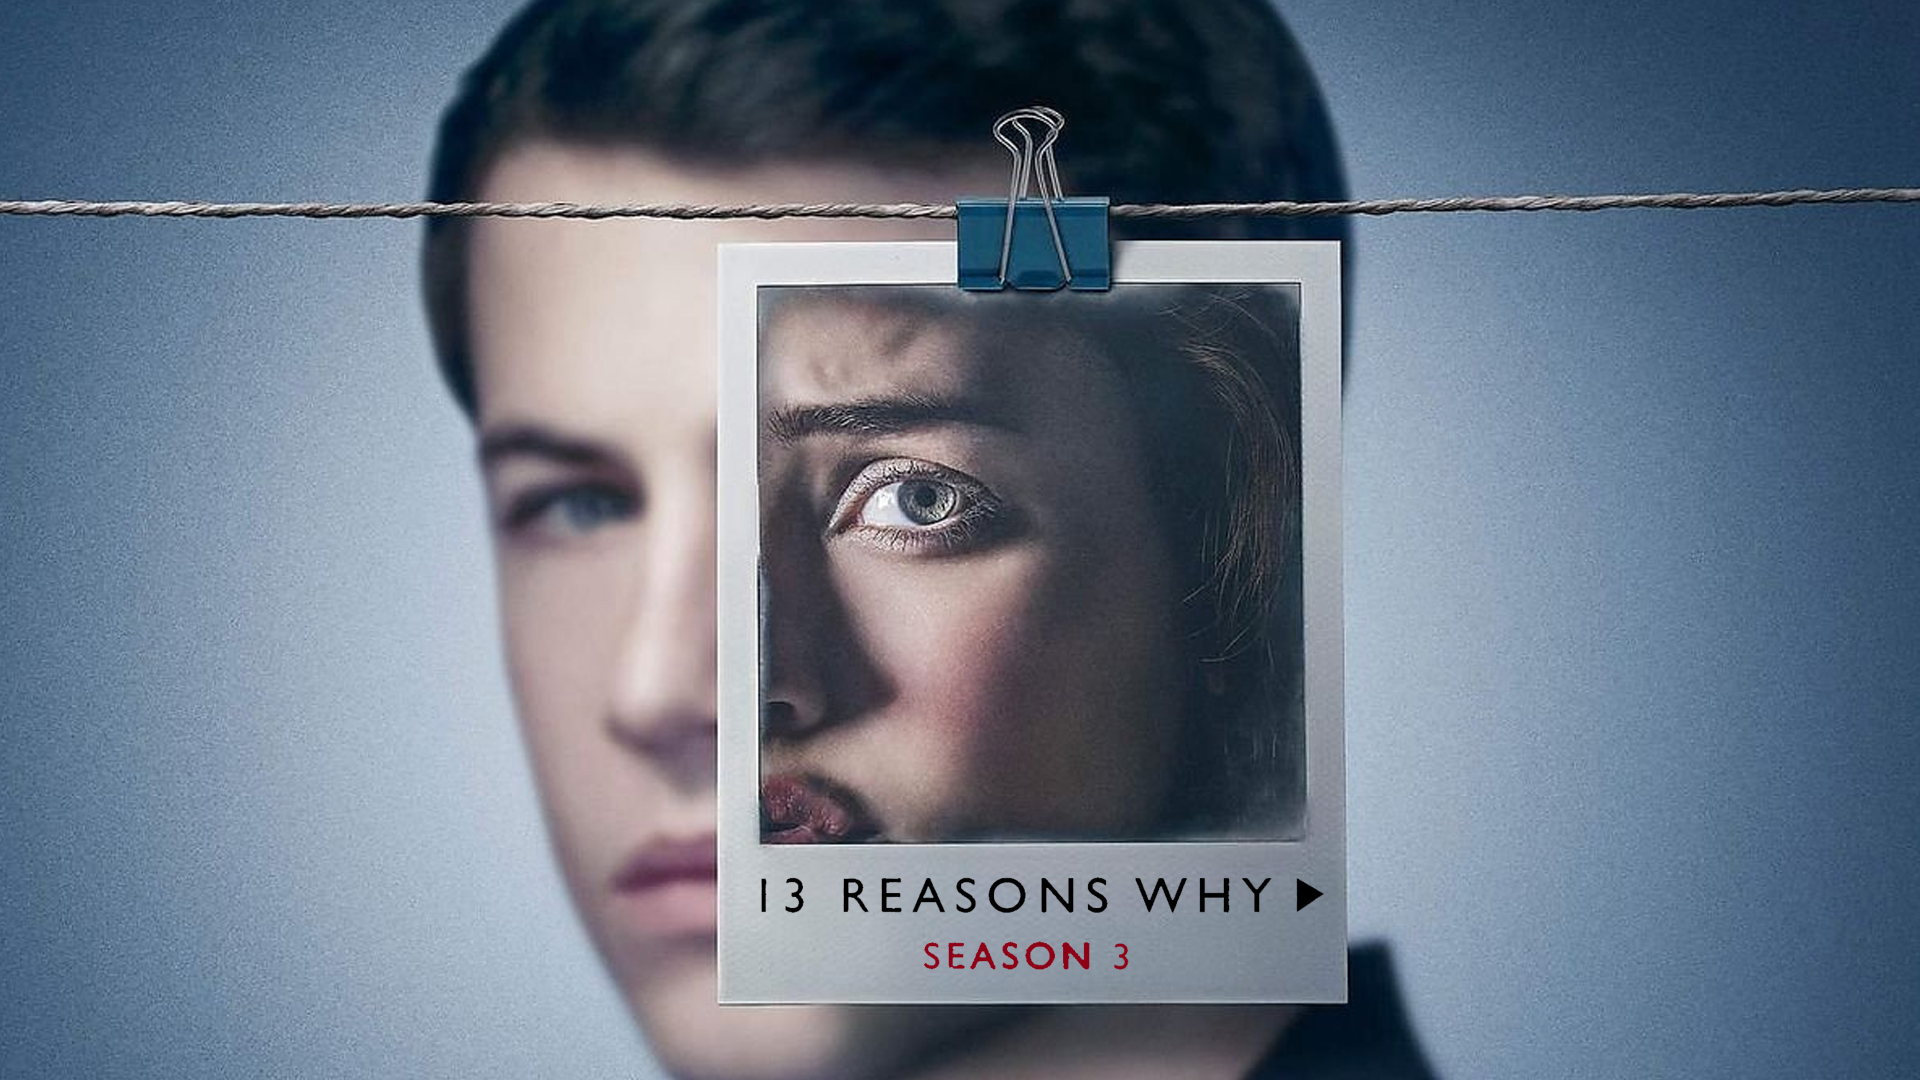 13 Reasons Why Saison 3 Octobre 2019